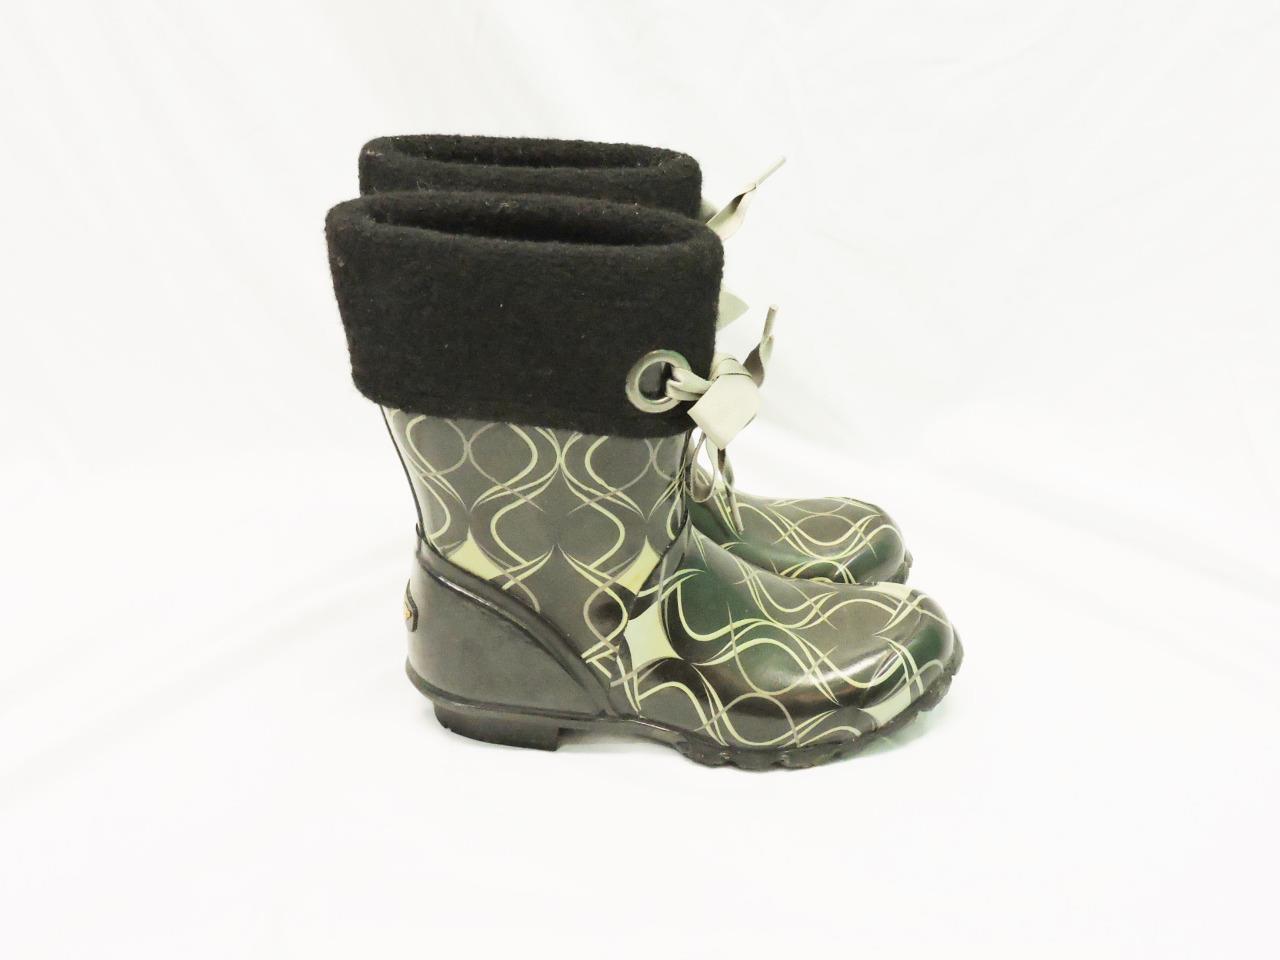 Bogs 7 Black Brown Becca Swirl Print Boots Fleece Lined Tie Top Rubber Rain Snow